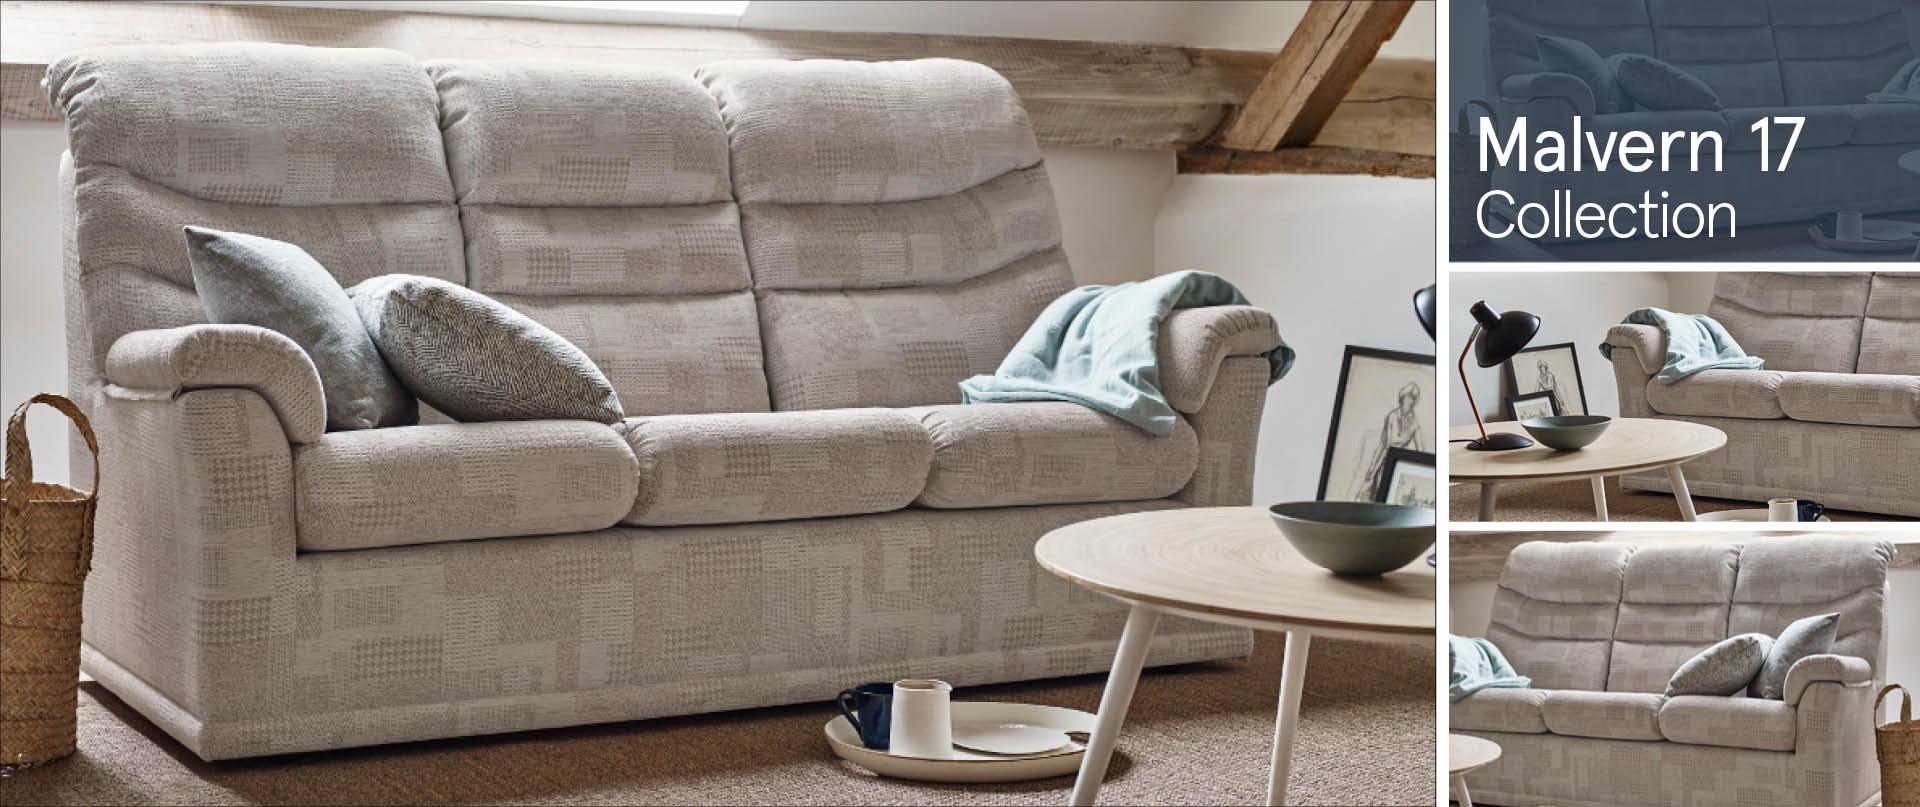 Malvern 17 Fabric Sofa Ranges